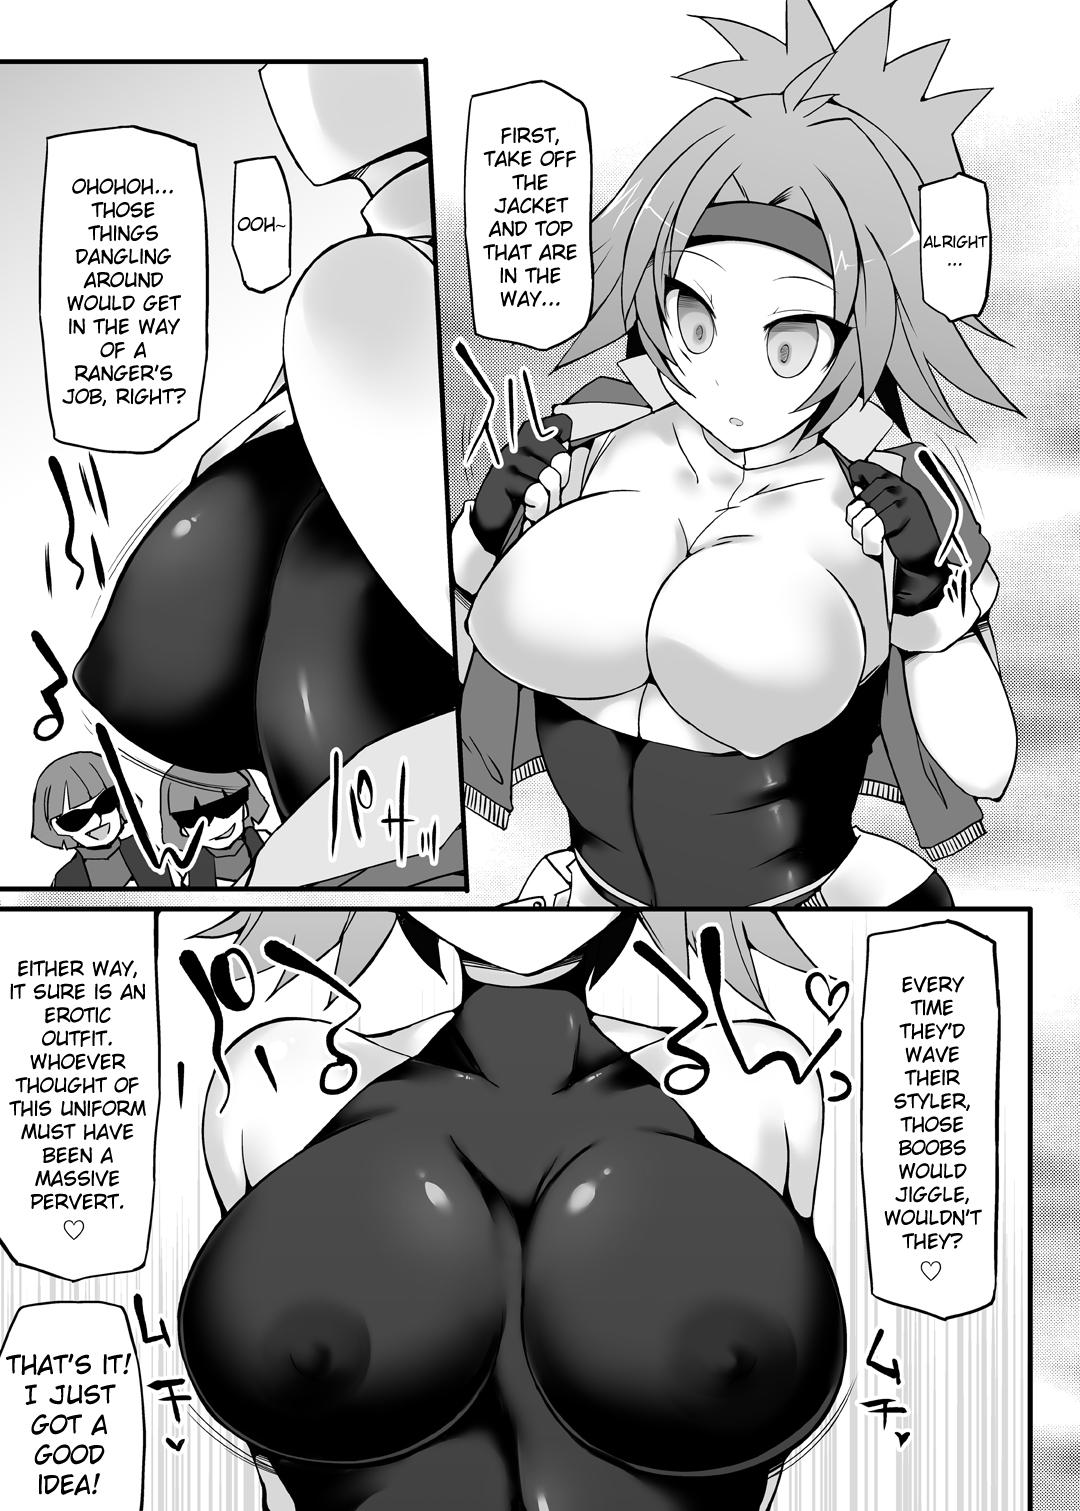 [Stapspats (Hisui)] Pokémon Ranger Hinata Kyousei Saimin Capture ~Onna Ranger Dosukebe Saimin Choukyou~ | Pokémon Ranger Solana's Forced Hypnosis Capture ~Female Ranger's Sexual Hypnosis Training~ (Pokémon) [Digital] [English] 6